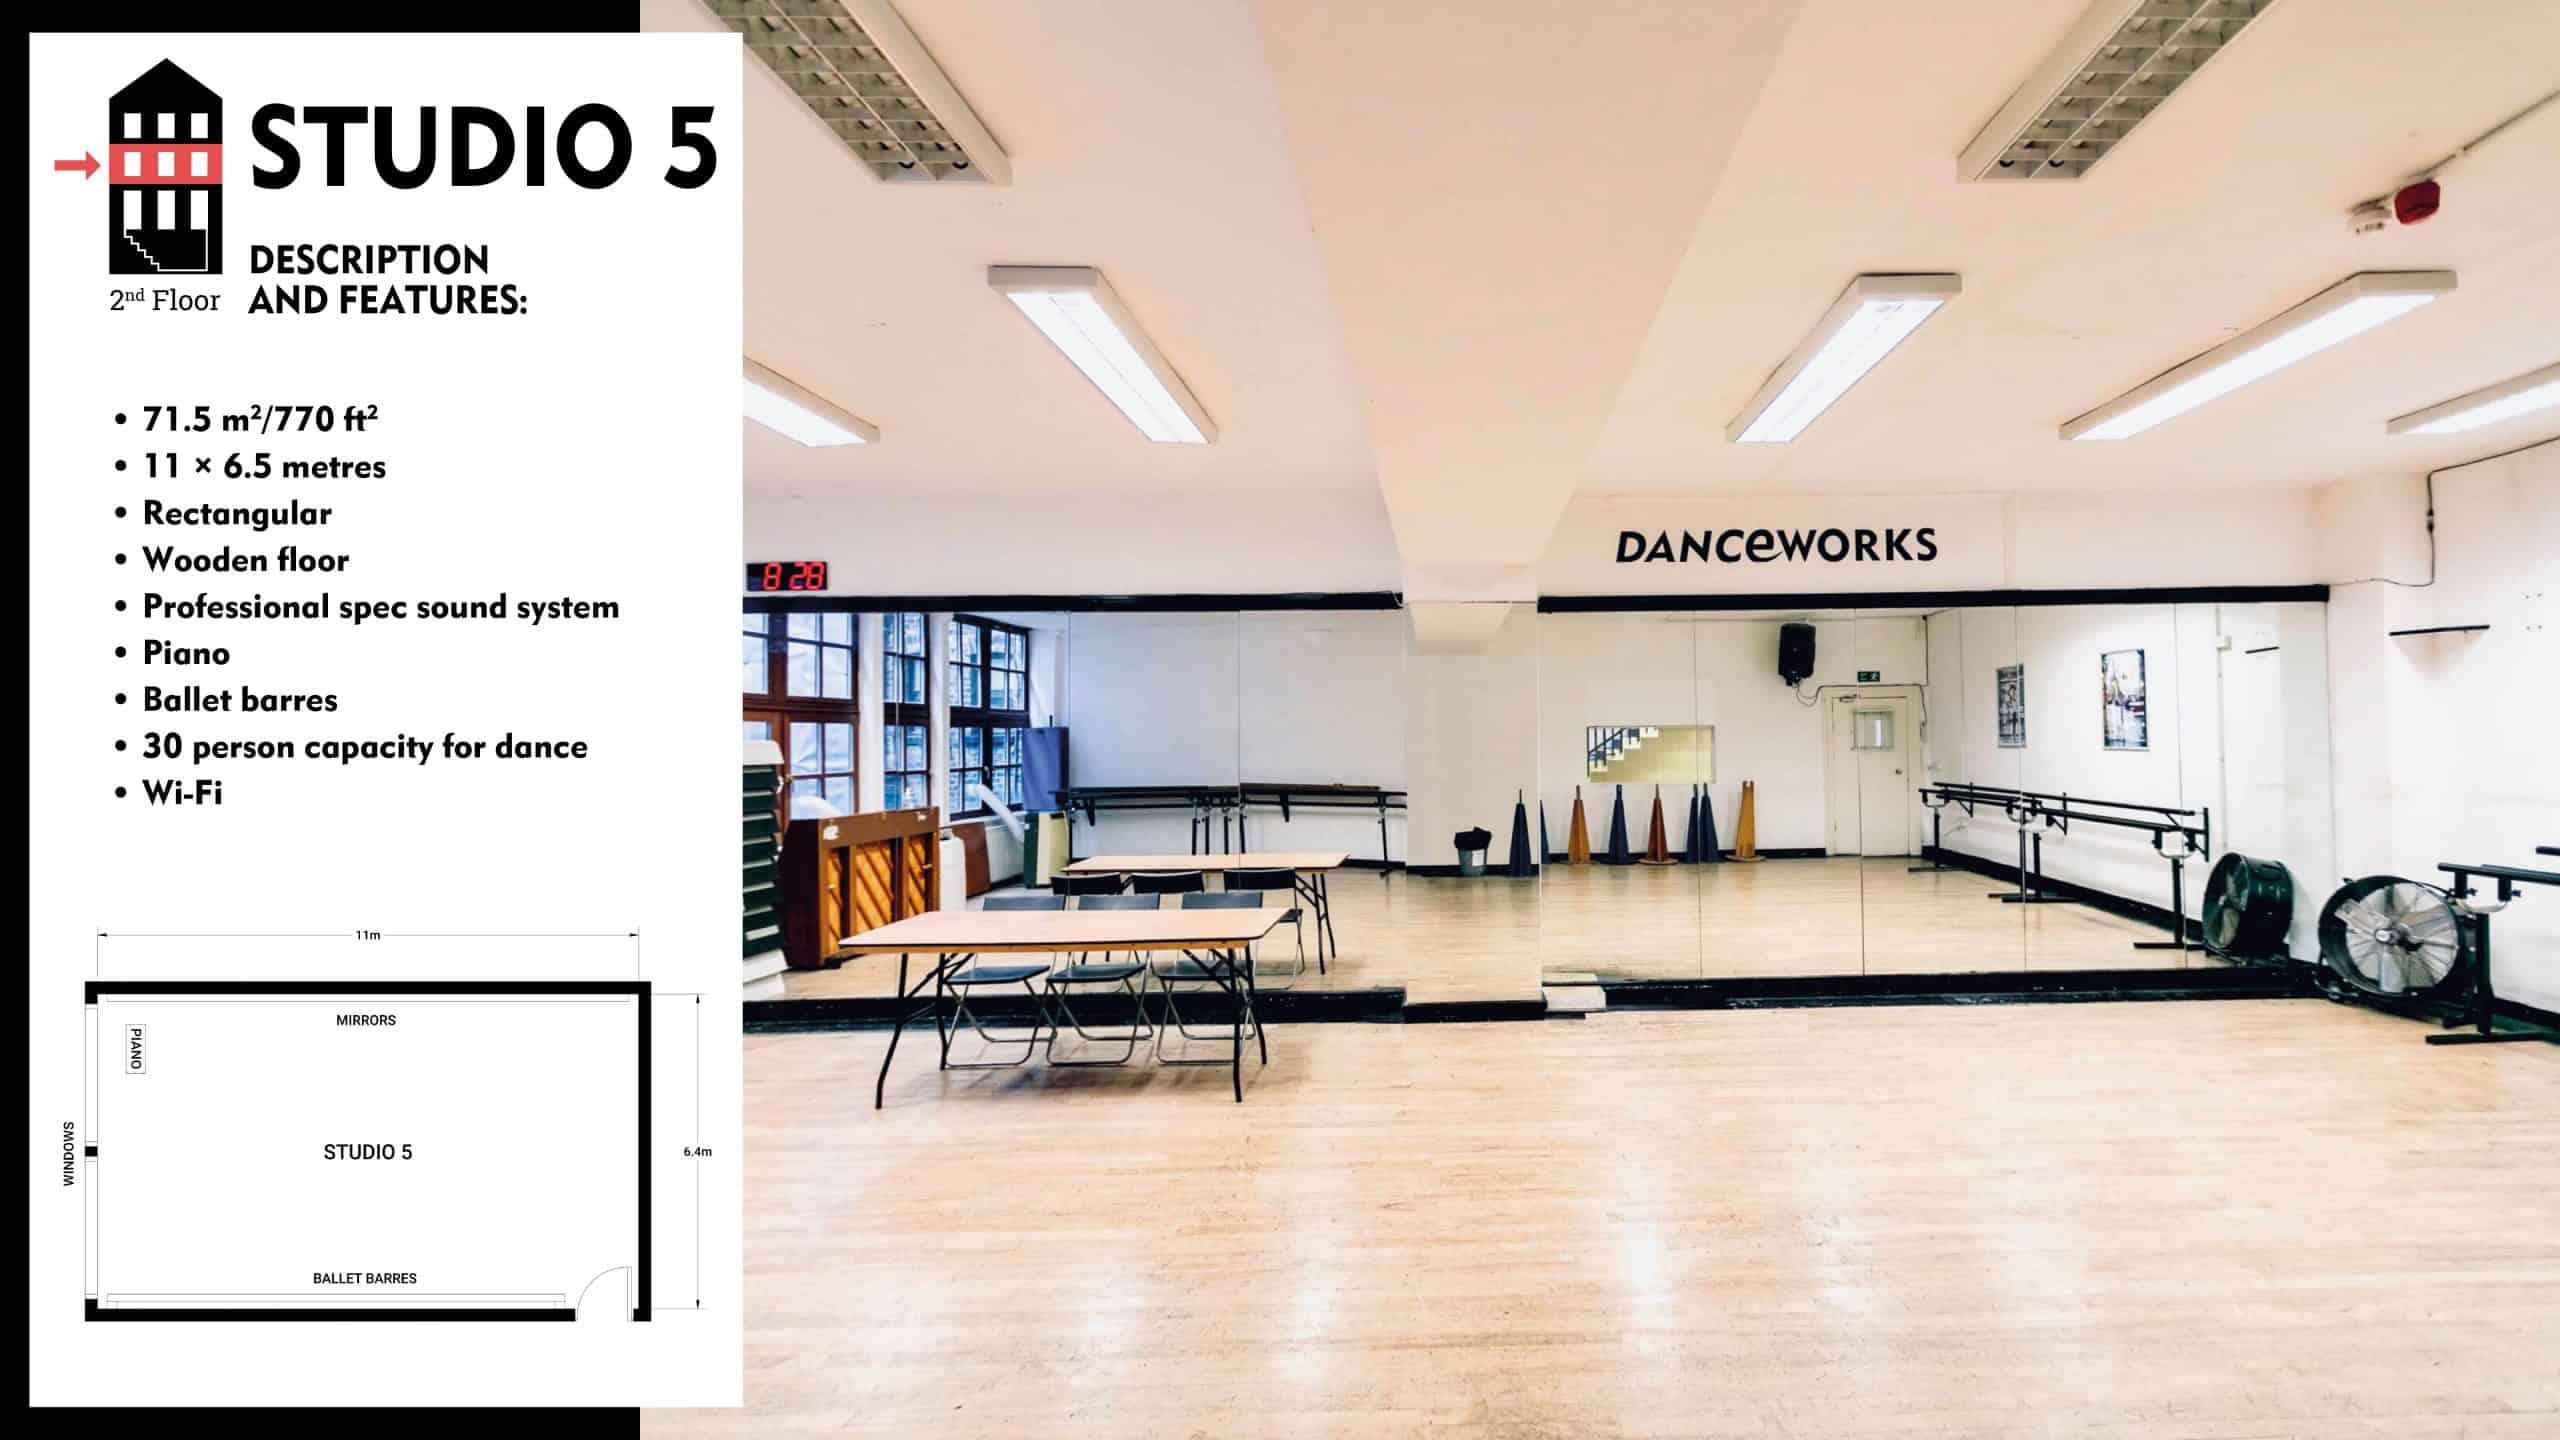 #Danceworks Studios 5 to Hire in London